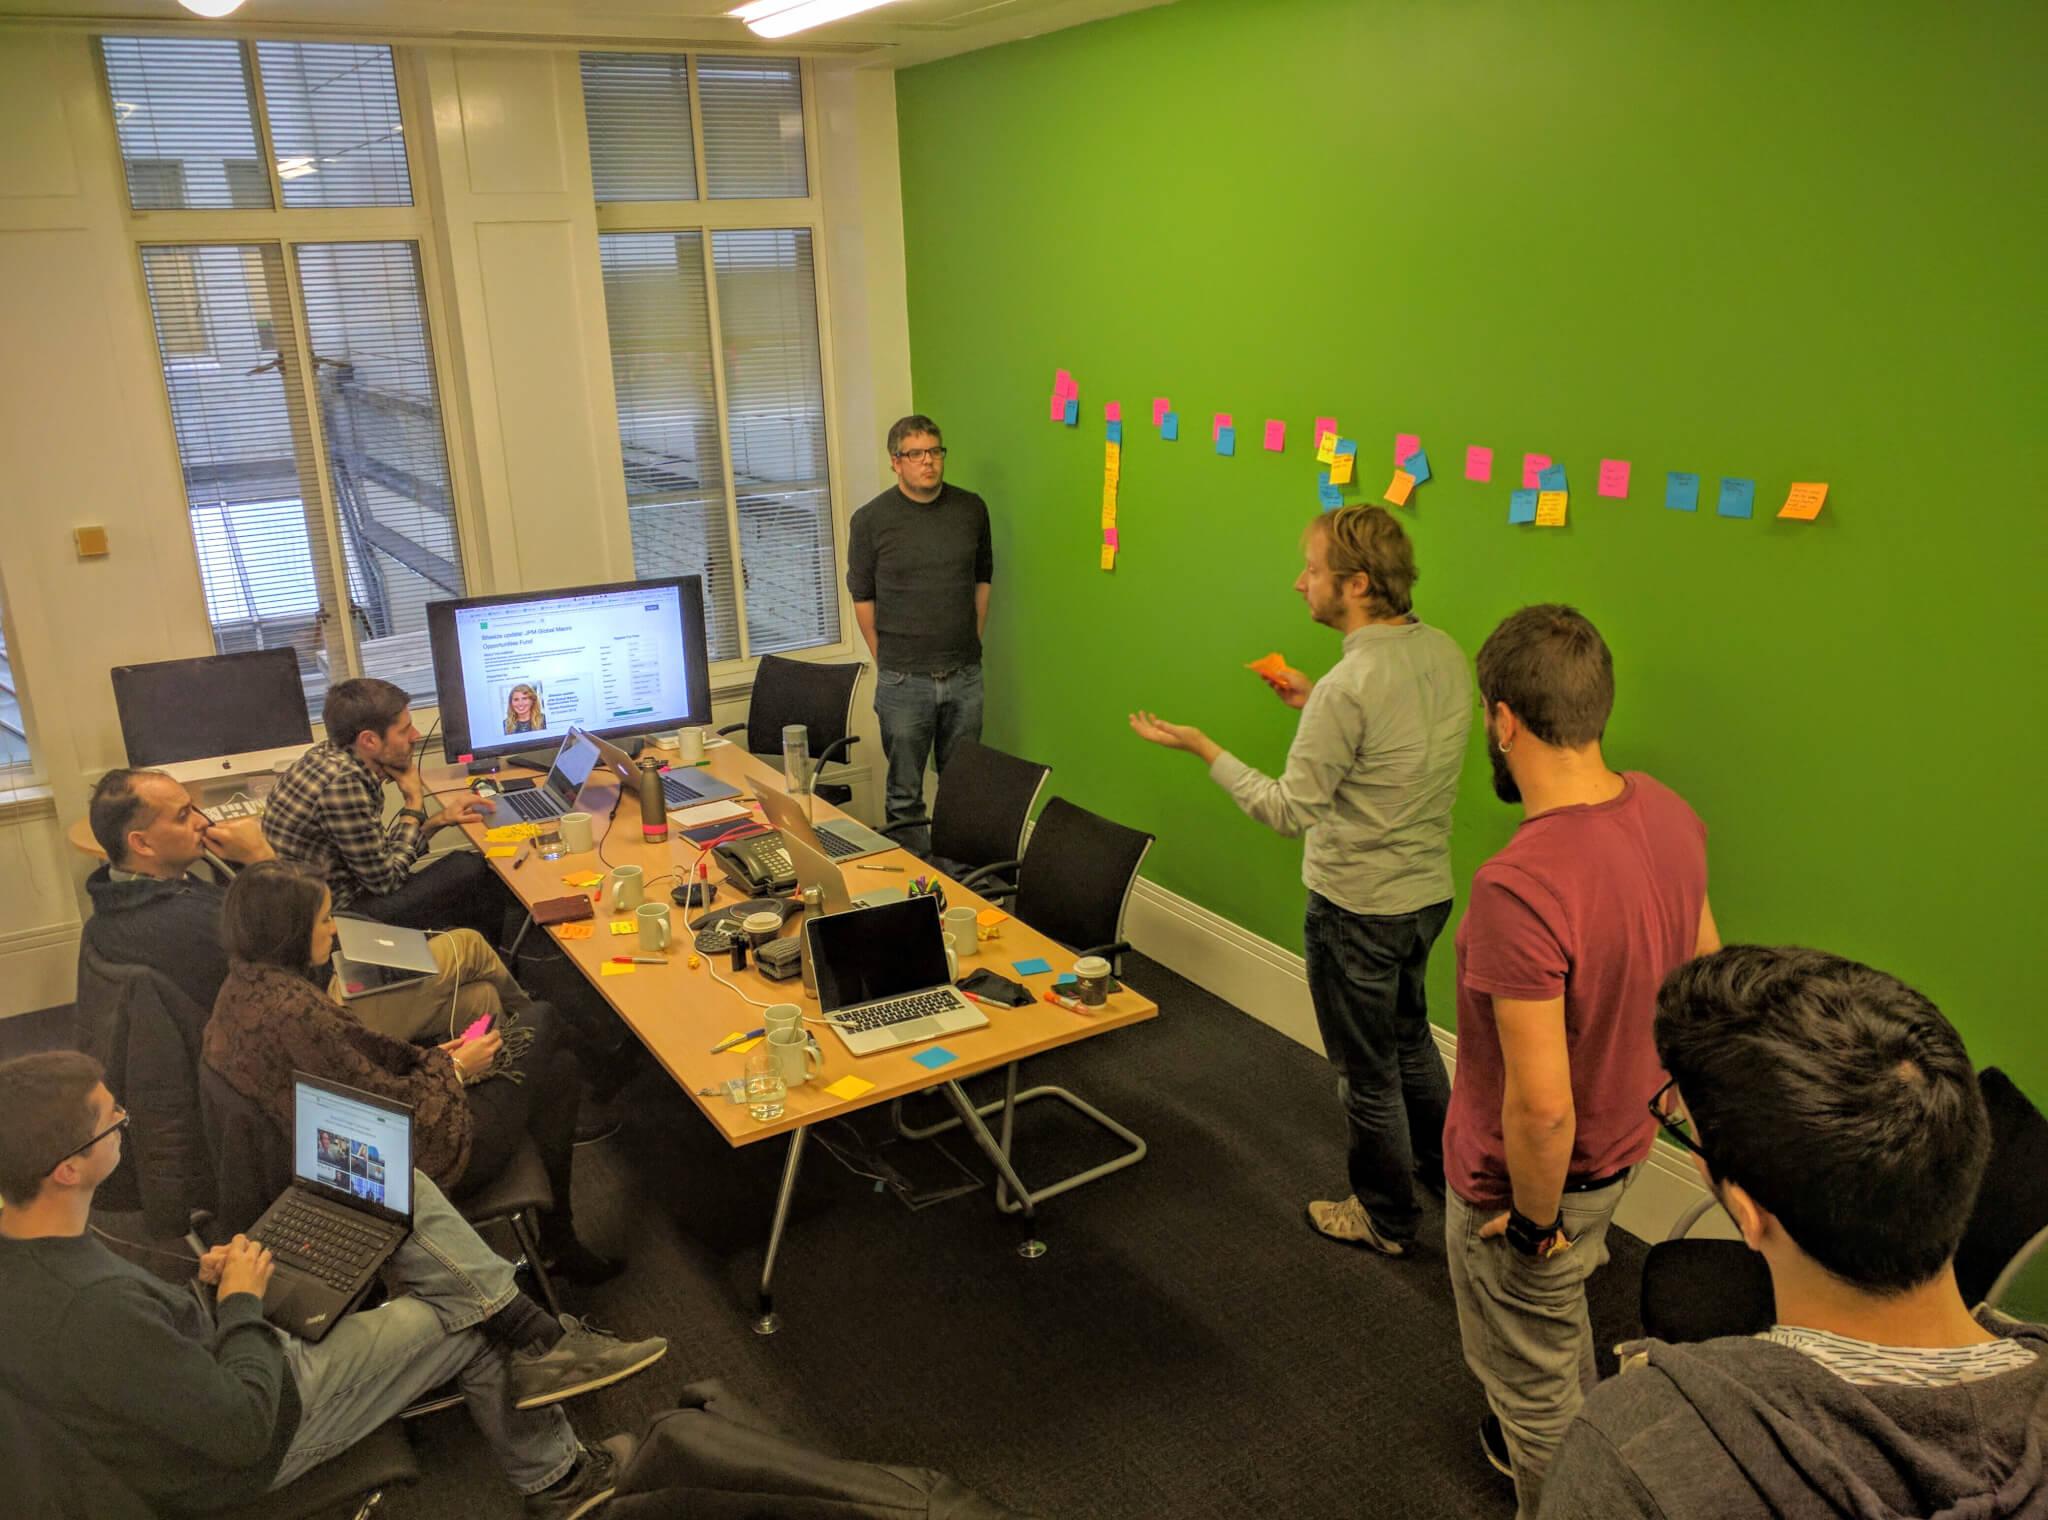 Growth Meeting - Brainstorm